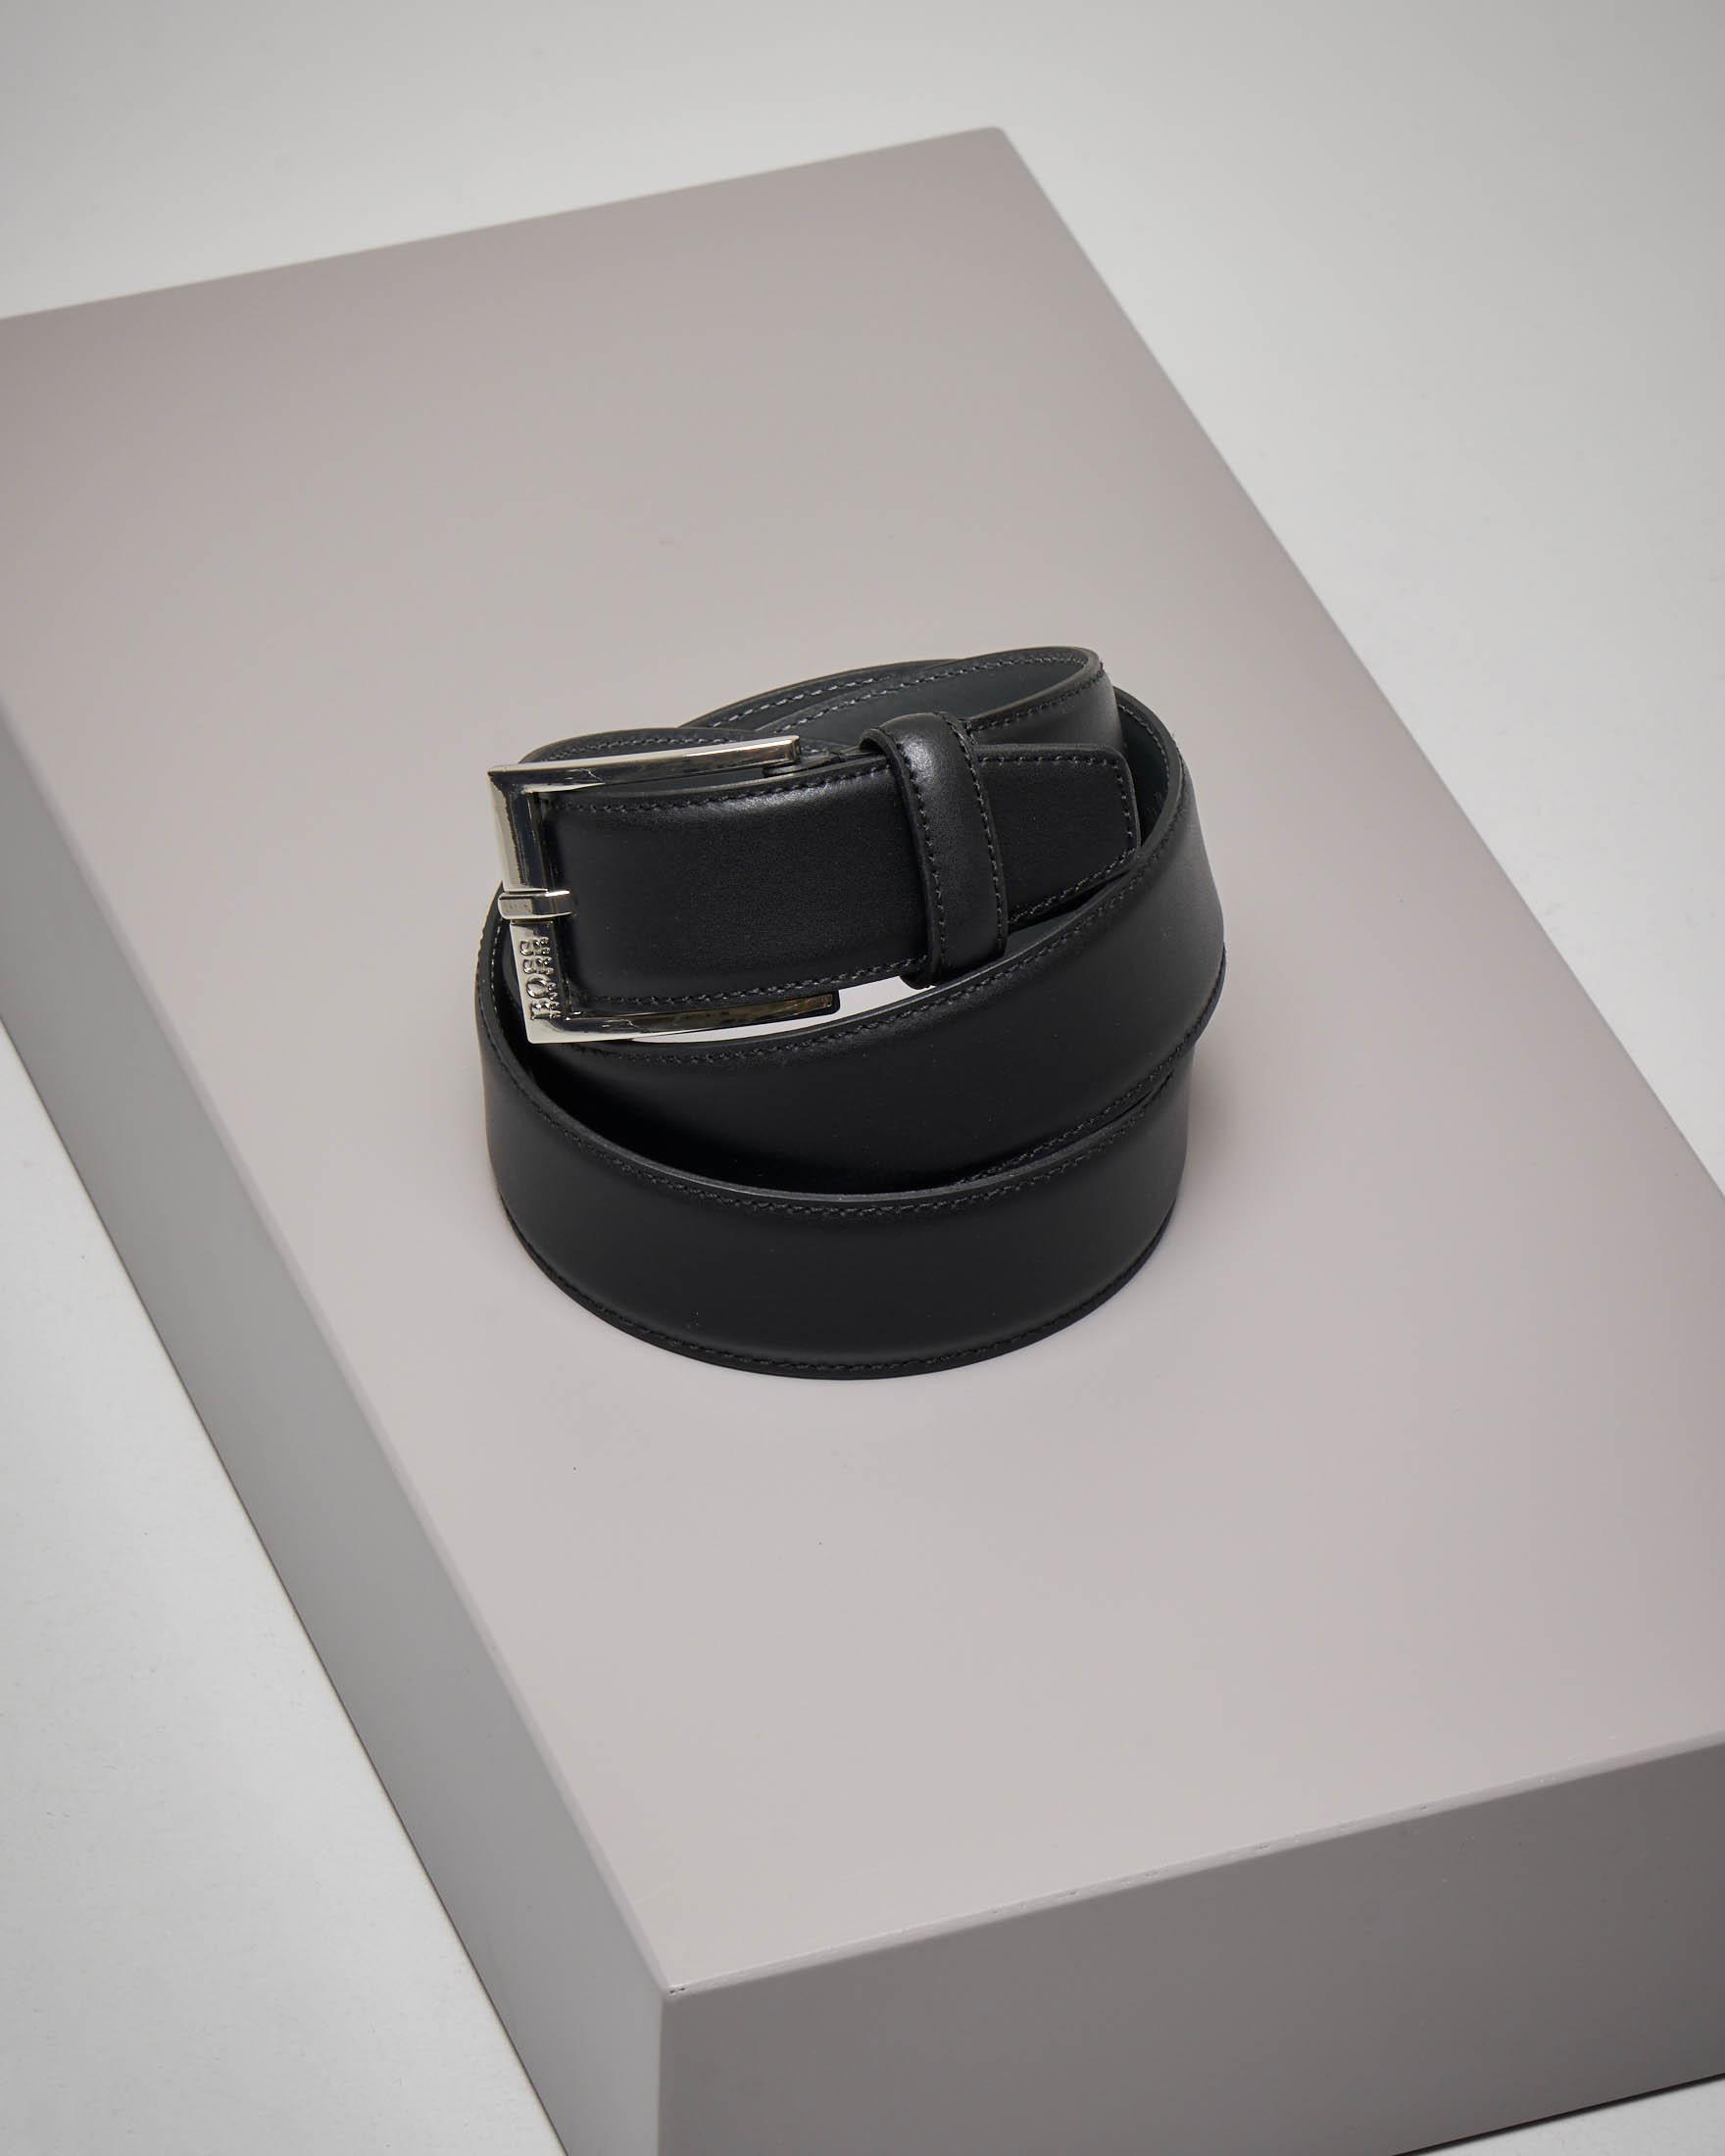 Cintura nera in pelle liscia